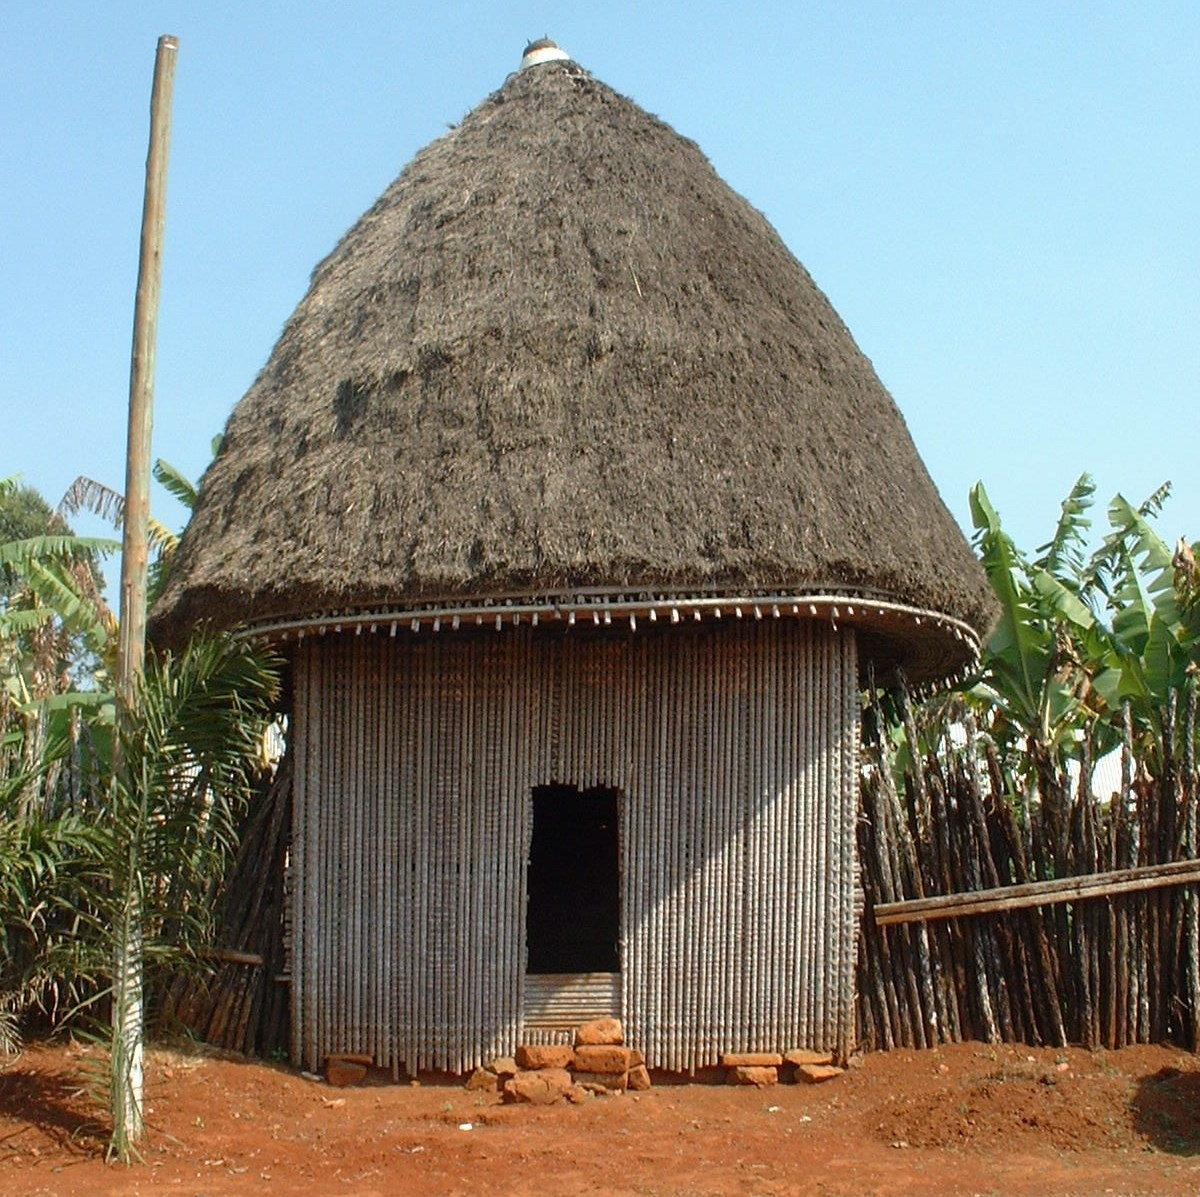 Жилище племен африки фото 15